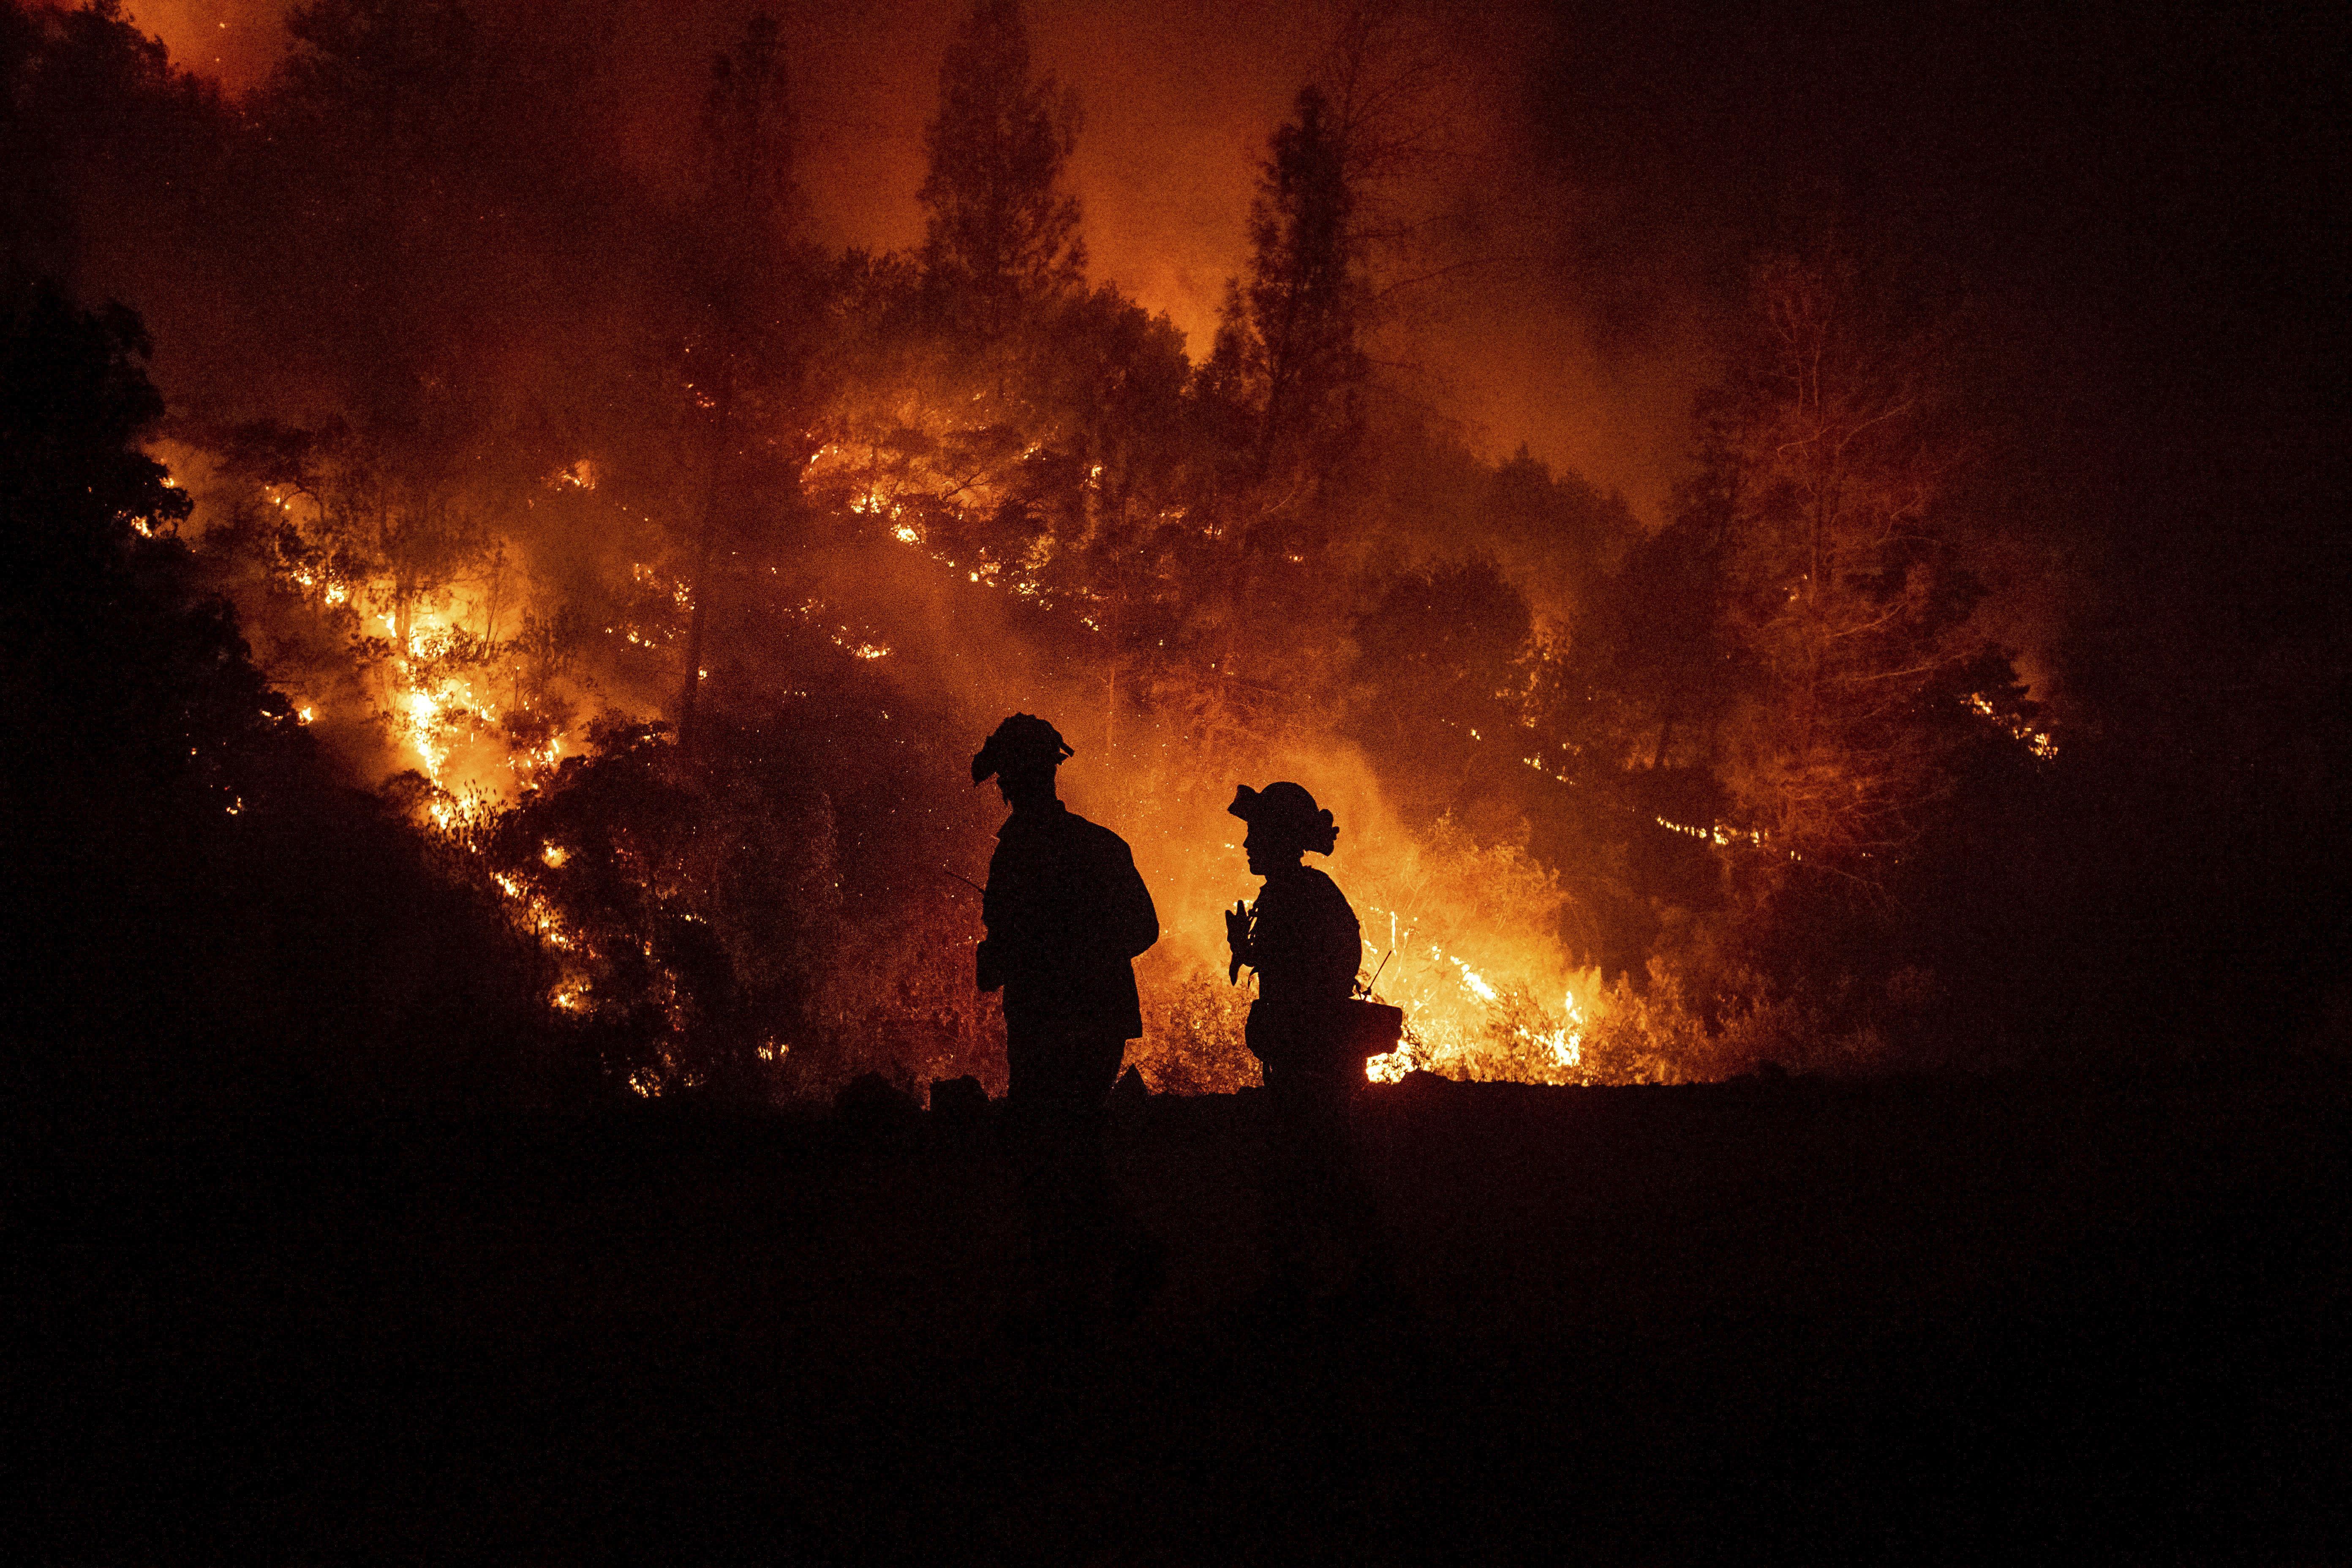 Forum on this topic: California wildfire season: warm weather making it , california-wildfire-season-warm-weather-making-it/